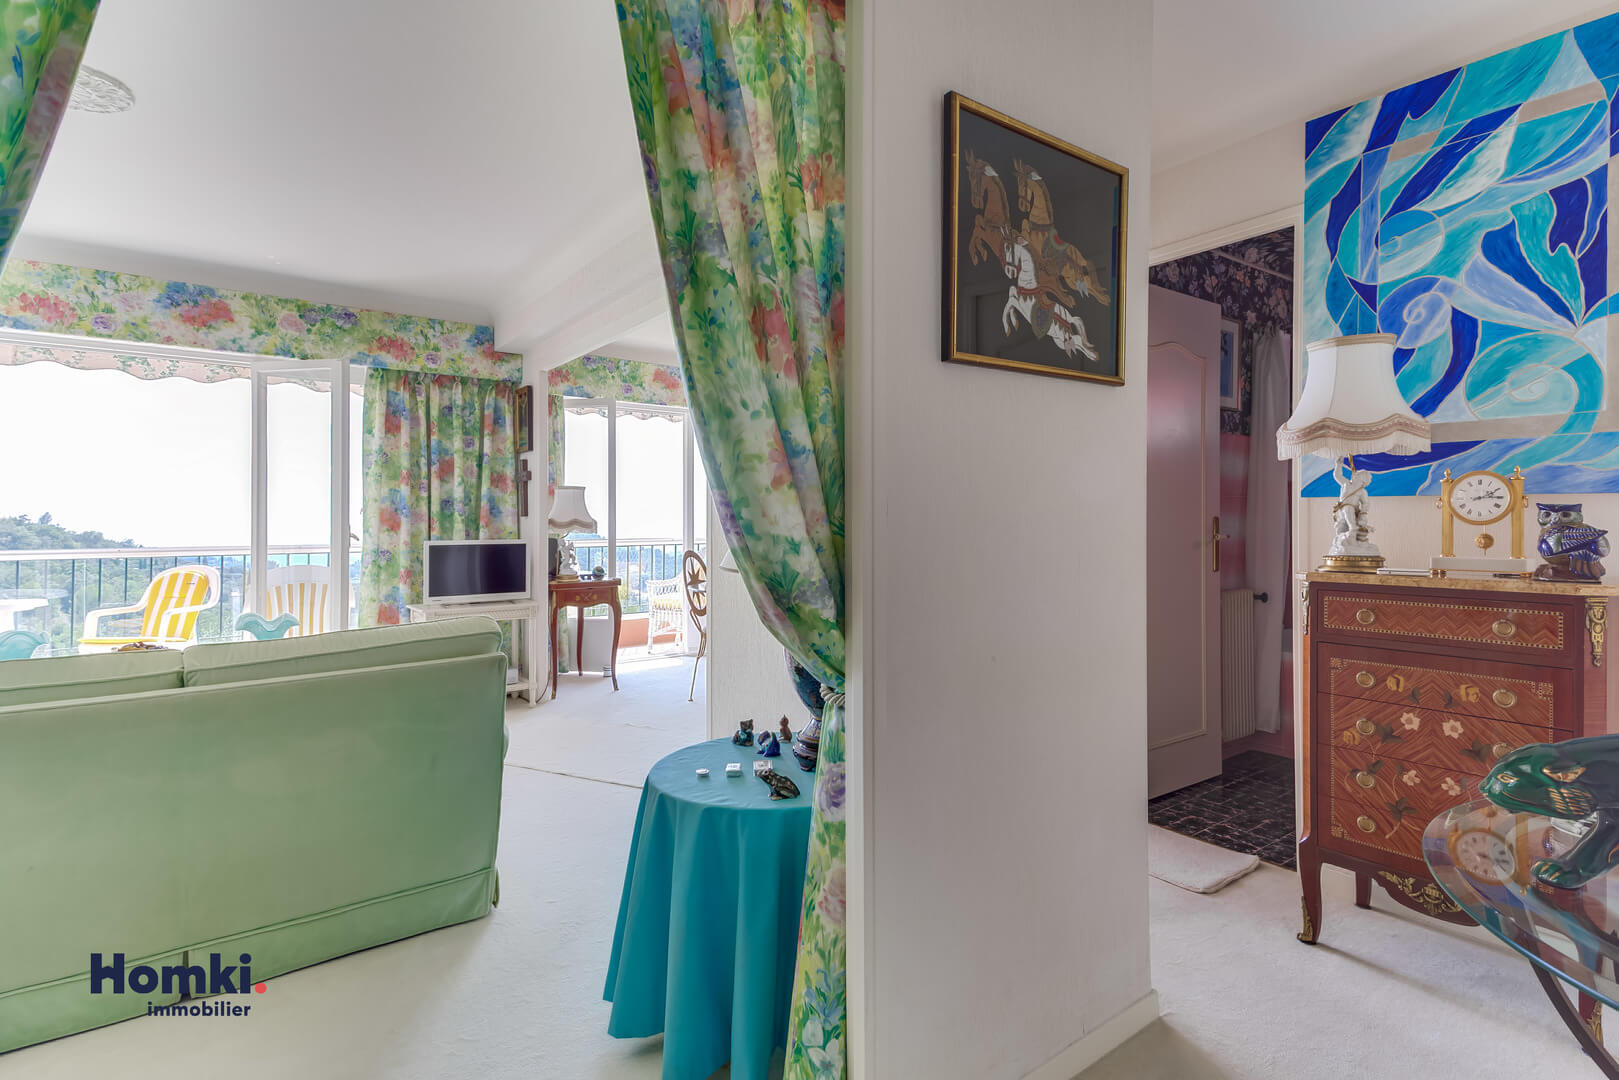 Vente appartement Grasse T3 06520 French Riviera_10